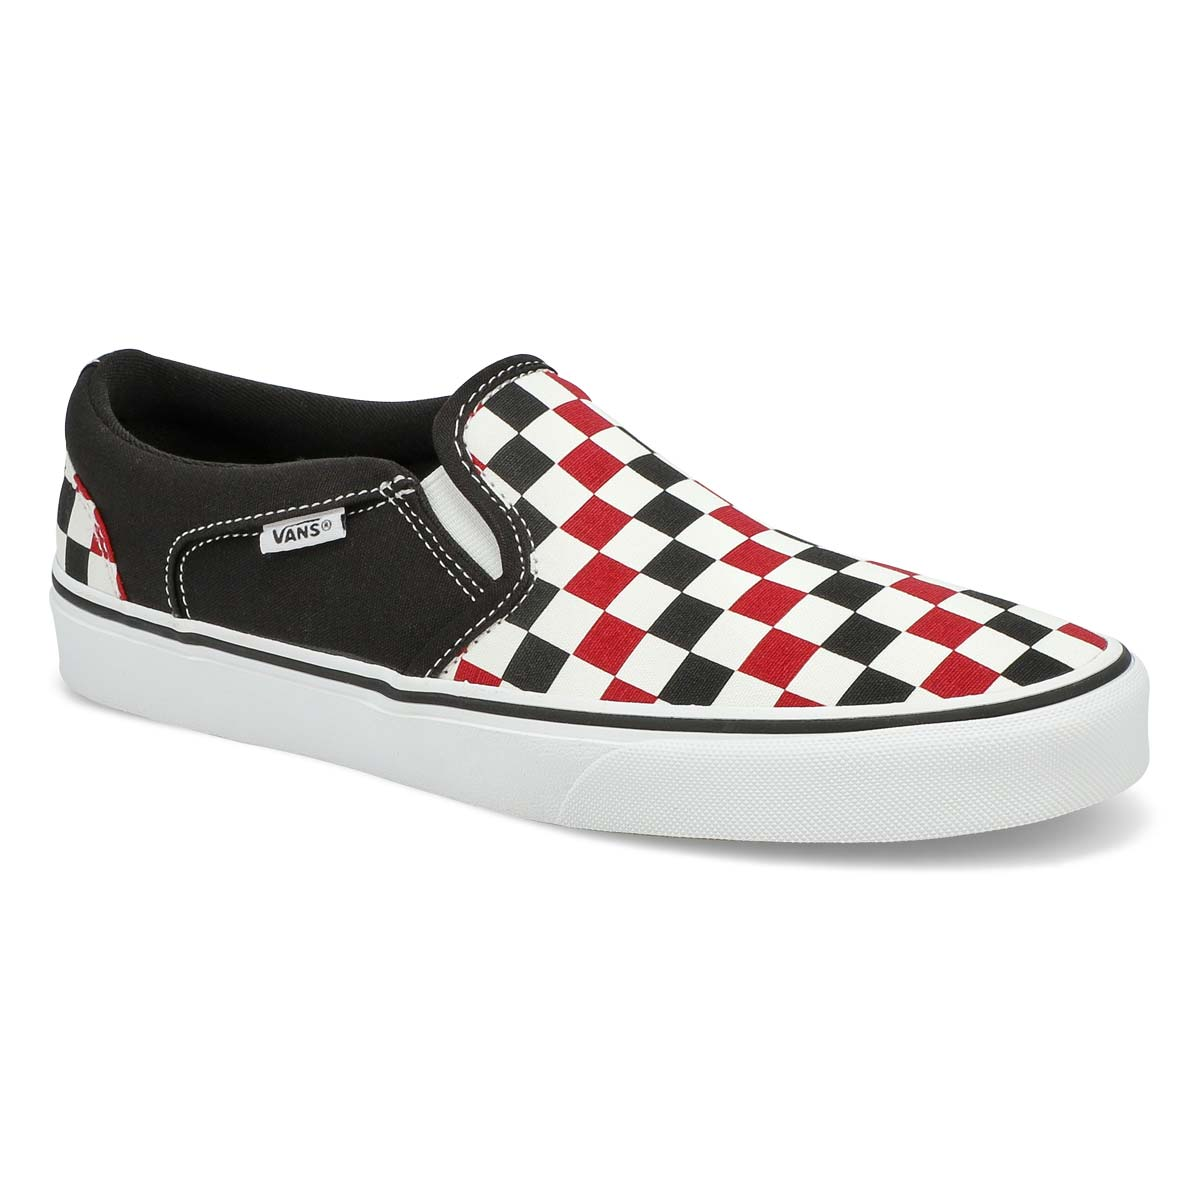 Men's Asher Slip On Sneaker- Checkered Chili/White